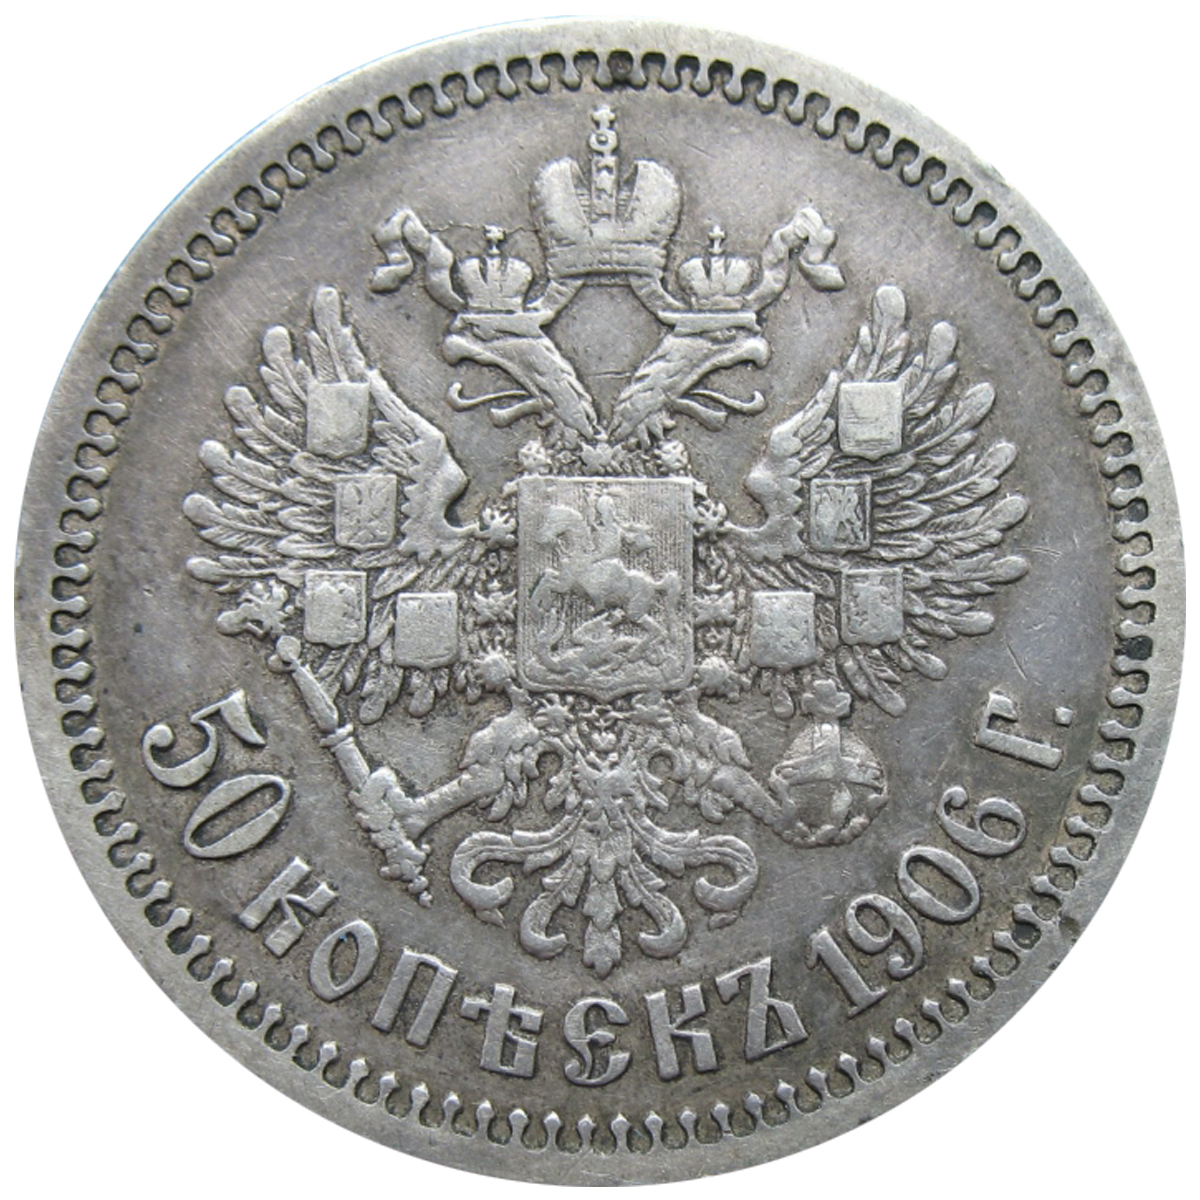 Монета 50 копеек серебряная 1906 год. Николай II